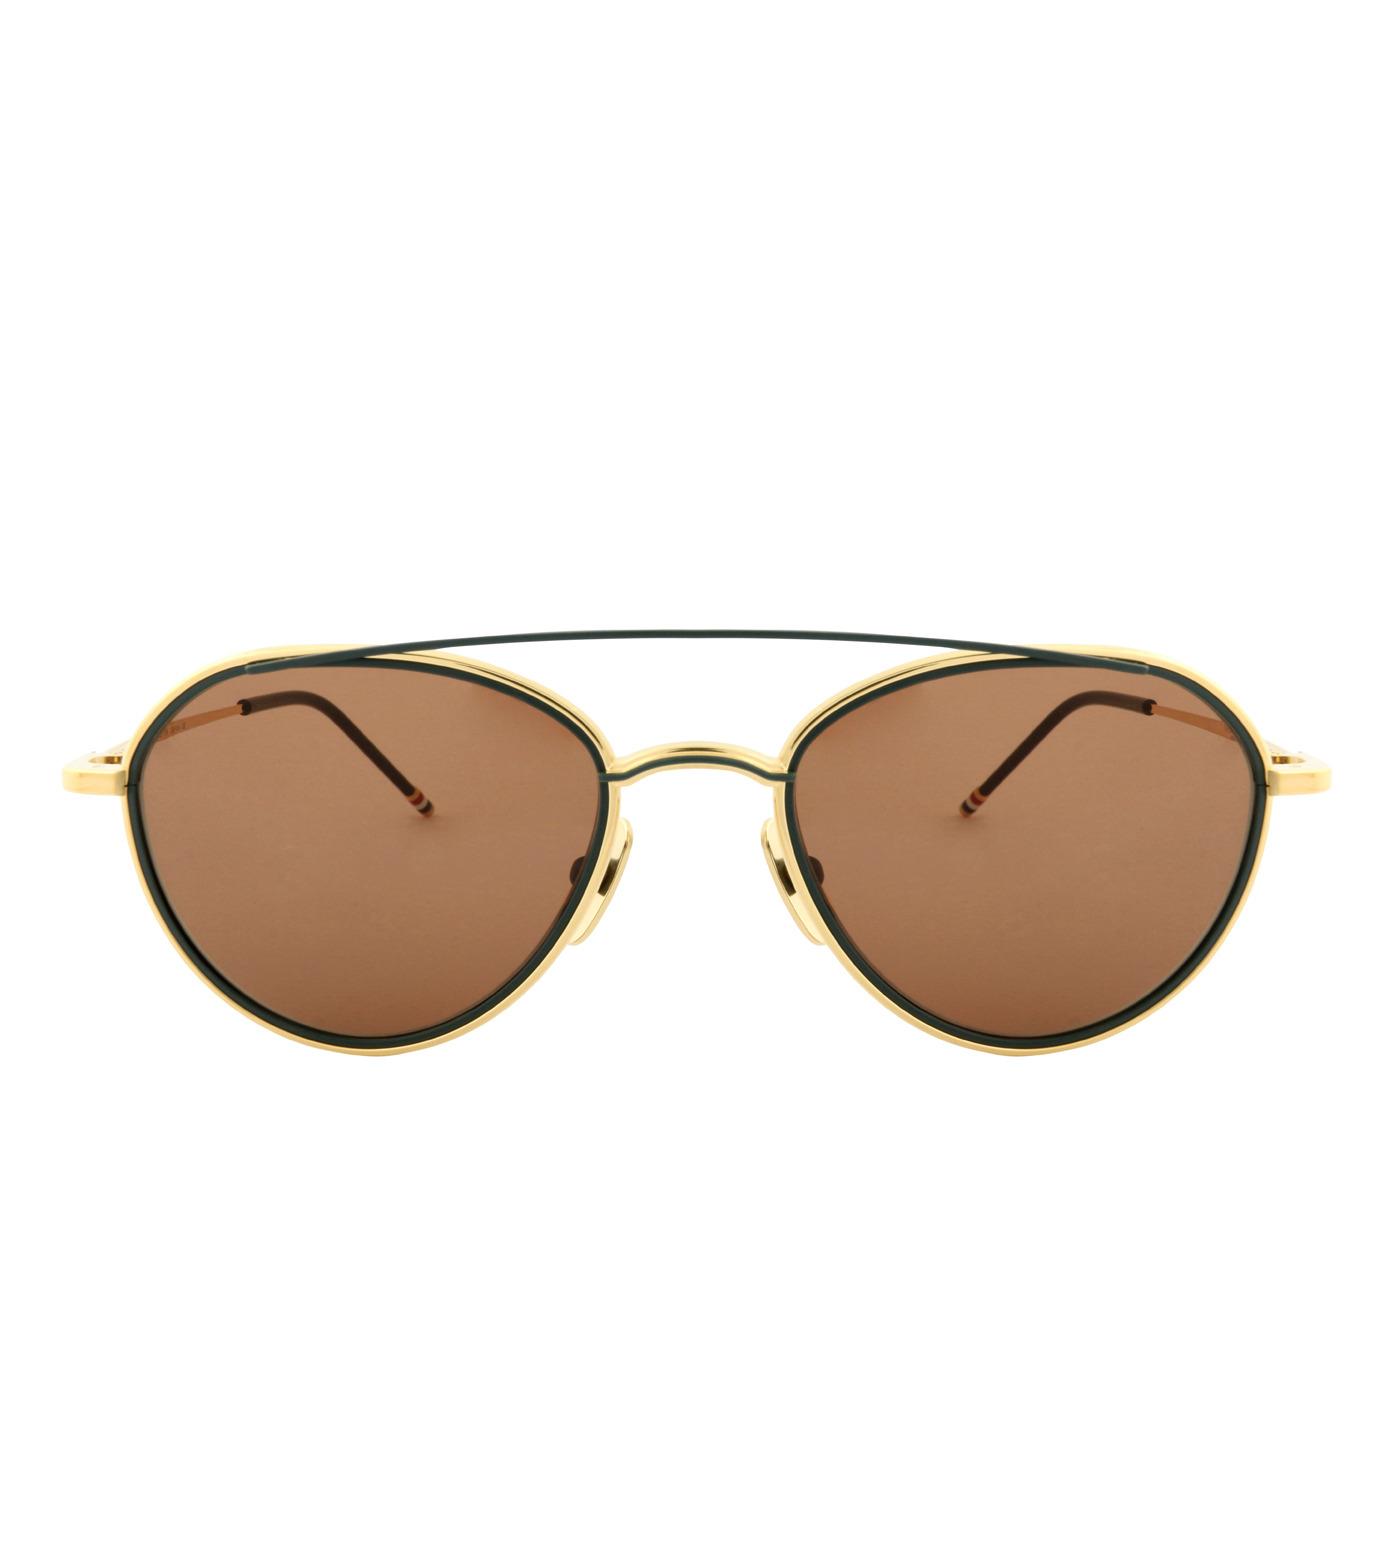 Thom Browne Eye Wear(トム・ブラウン・アイウェア)のGold Frame-SILVER(アイウェア/eyewear)-TB-109-C-T-1 拡大詳細画像3